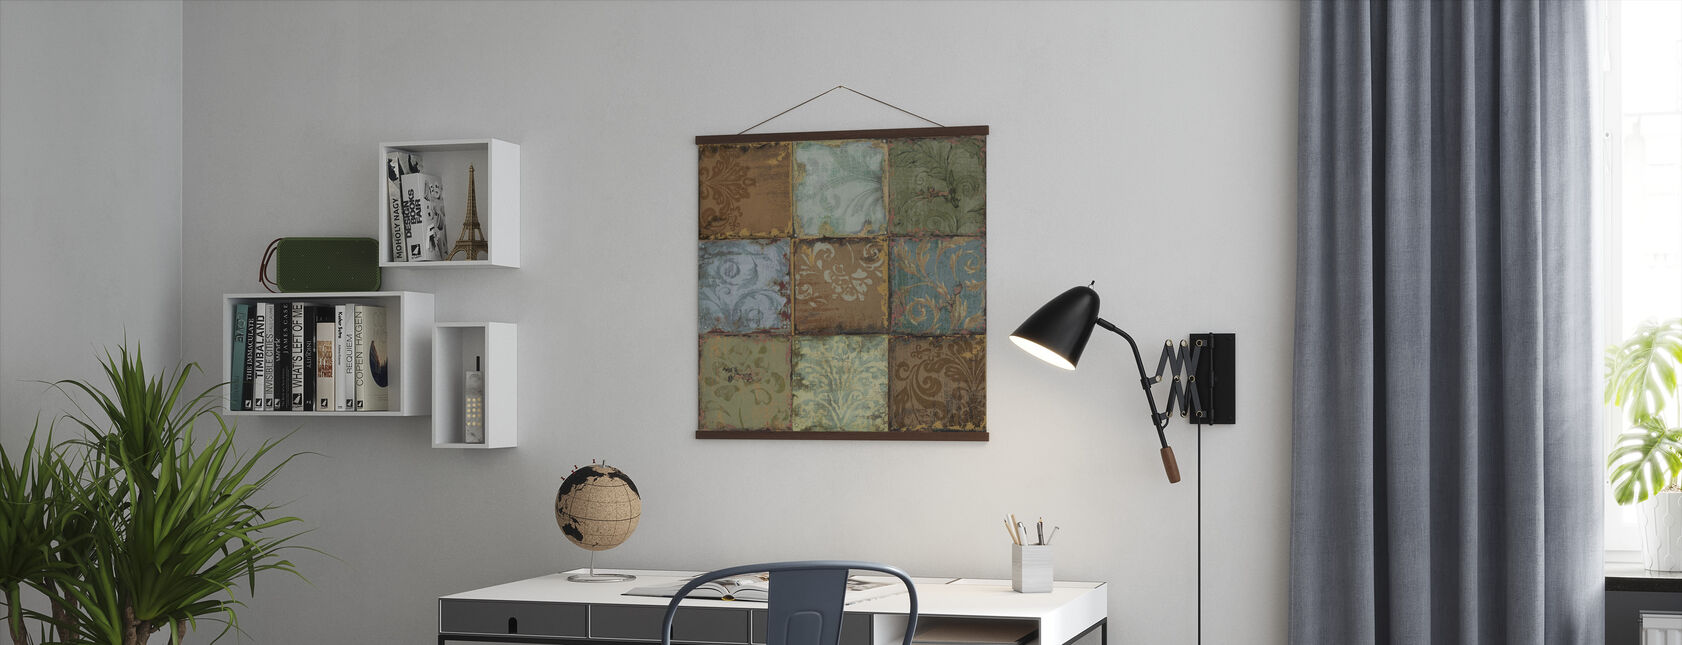 Tapestry Tiles 2 - Poster - Office